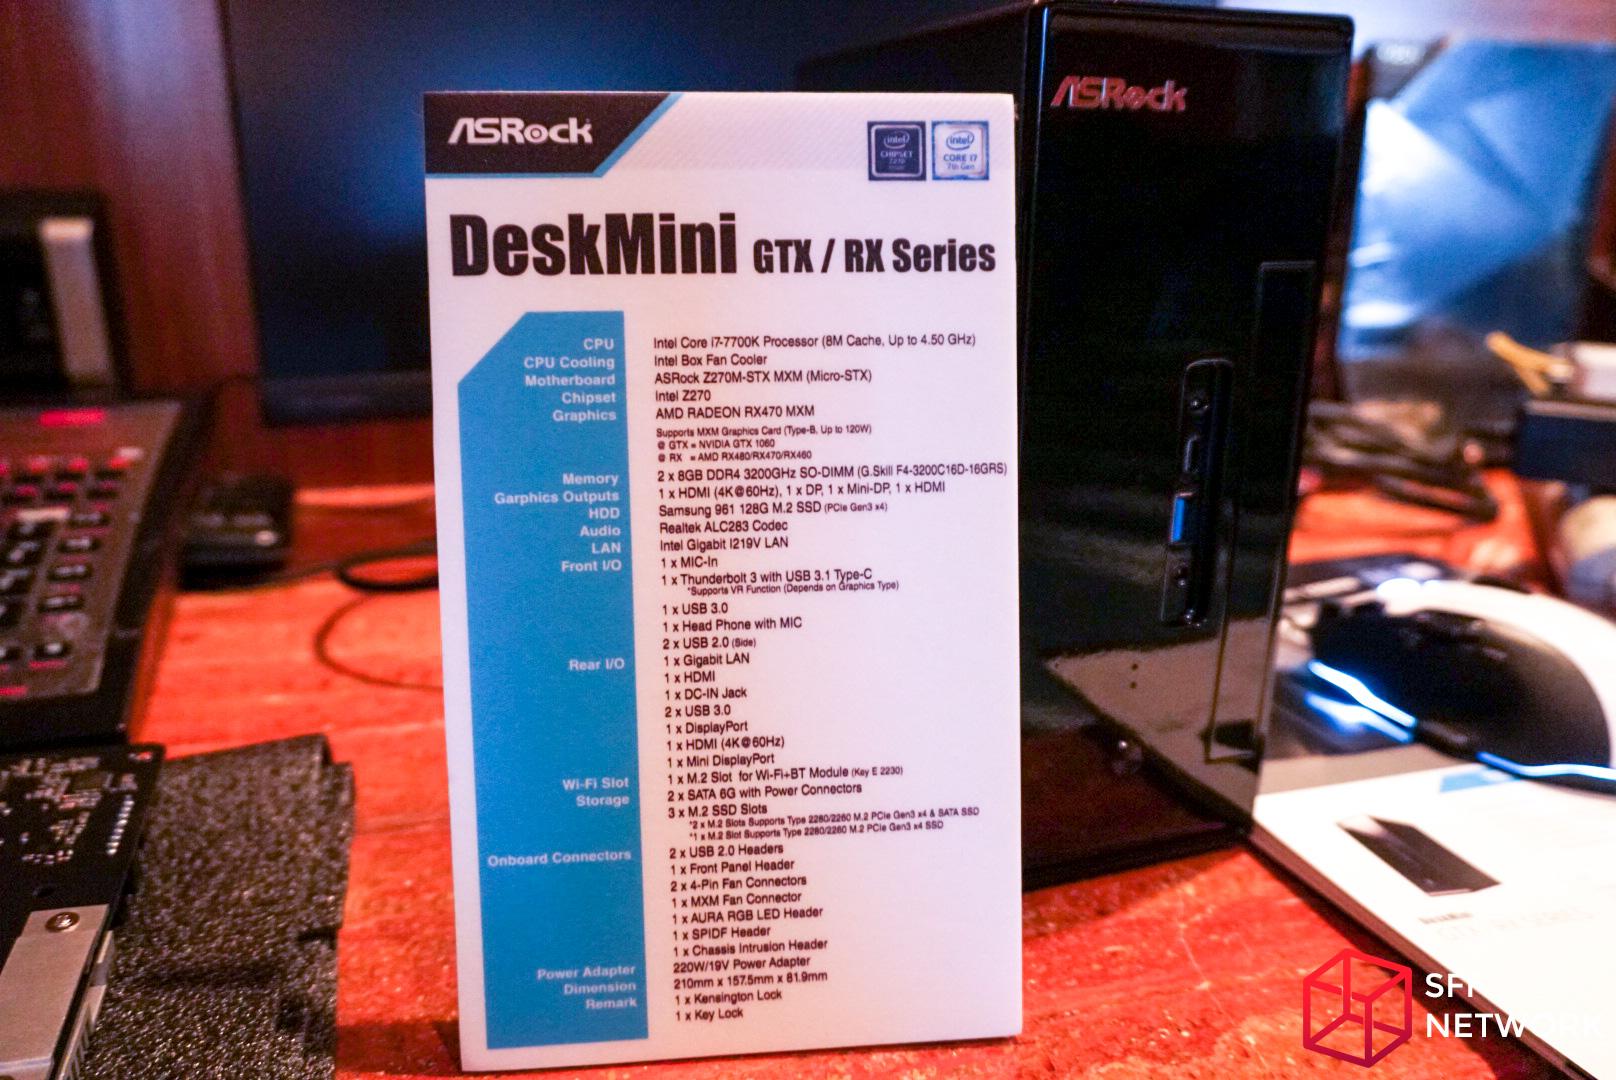 ASRock Shows DeskMini GTX/RX, using Micro-STX Motherboard